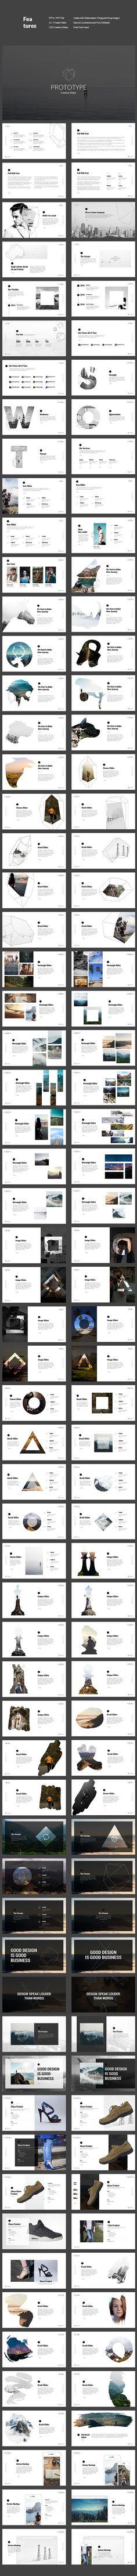 Prototype #Powerpoint - PowerPoint Templates #Presentation #Templates Download here: https://graphicriver.net/item/prototype-powerpoint/19539021?ref=alena994